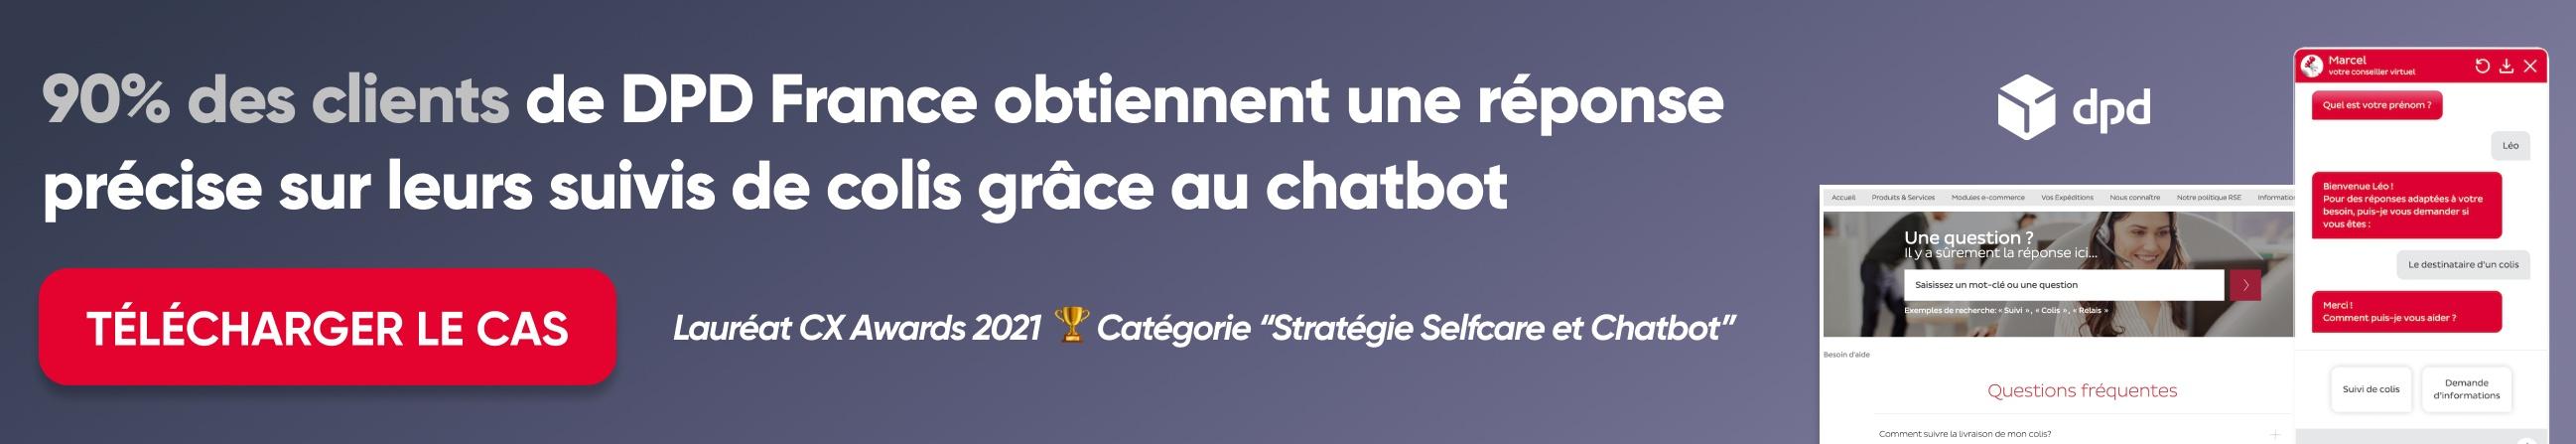 DPD France CX awards chatbot